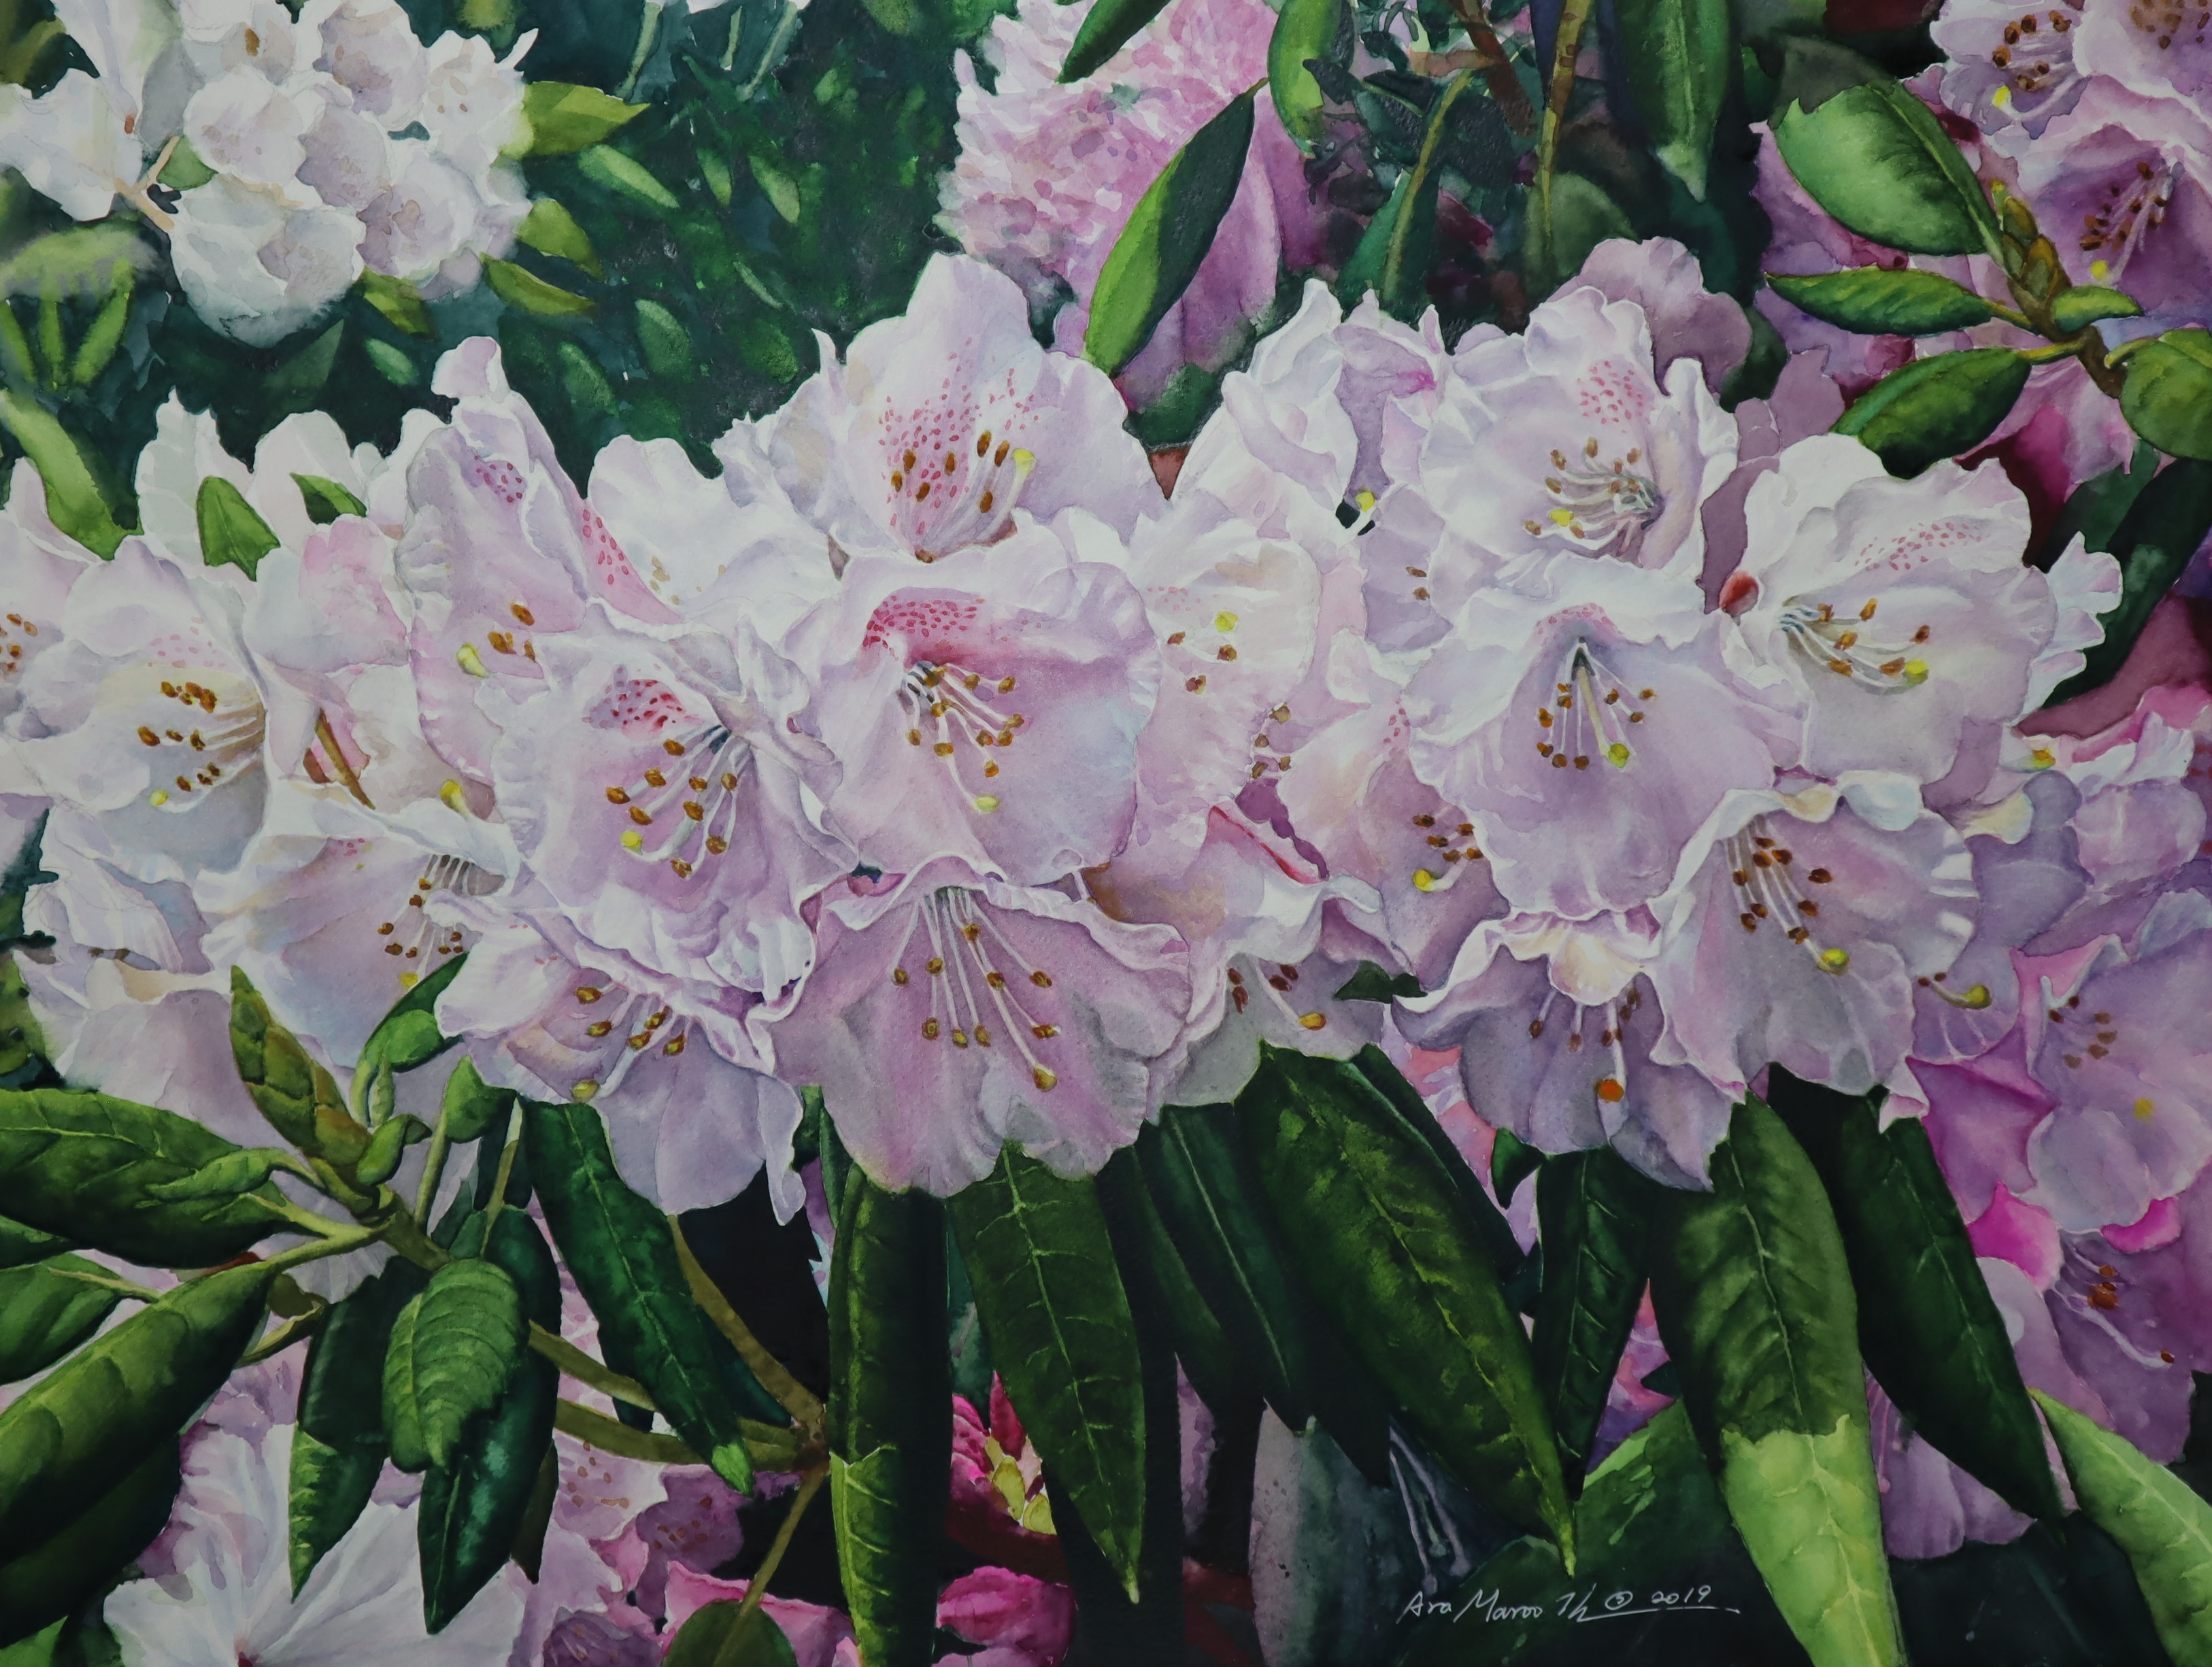 The Midsummer Blossoms